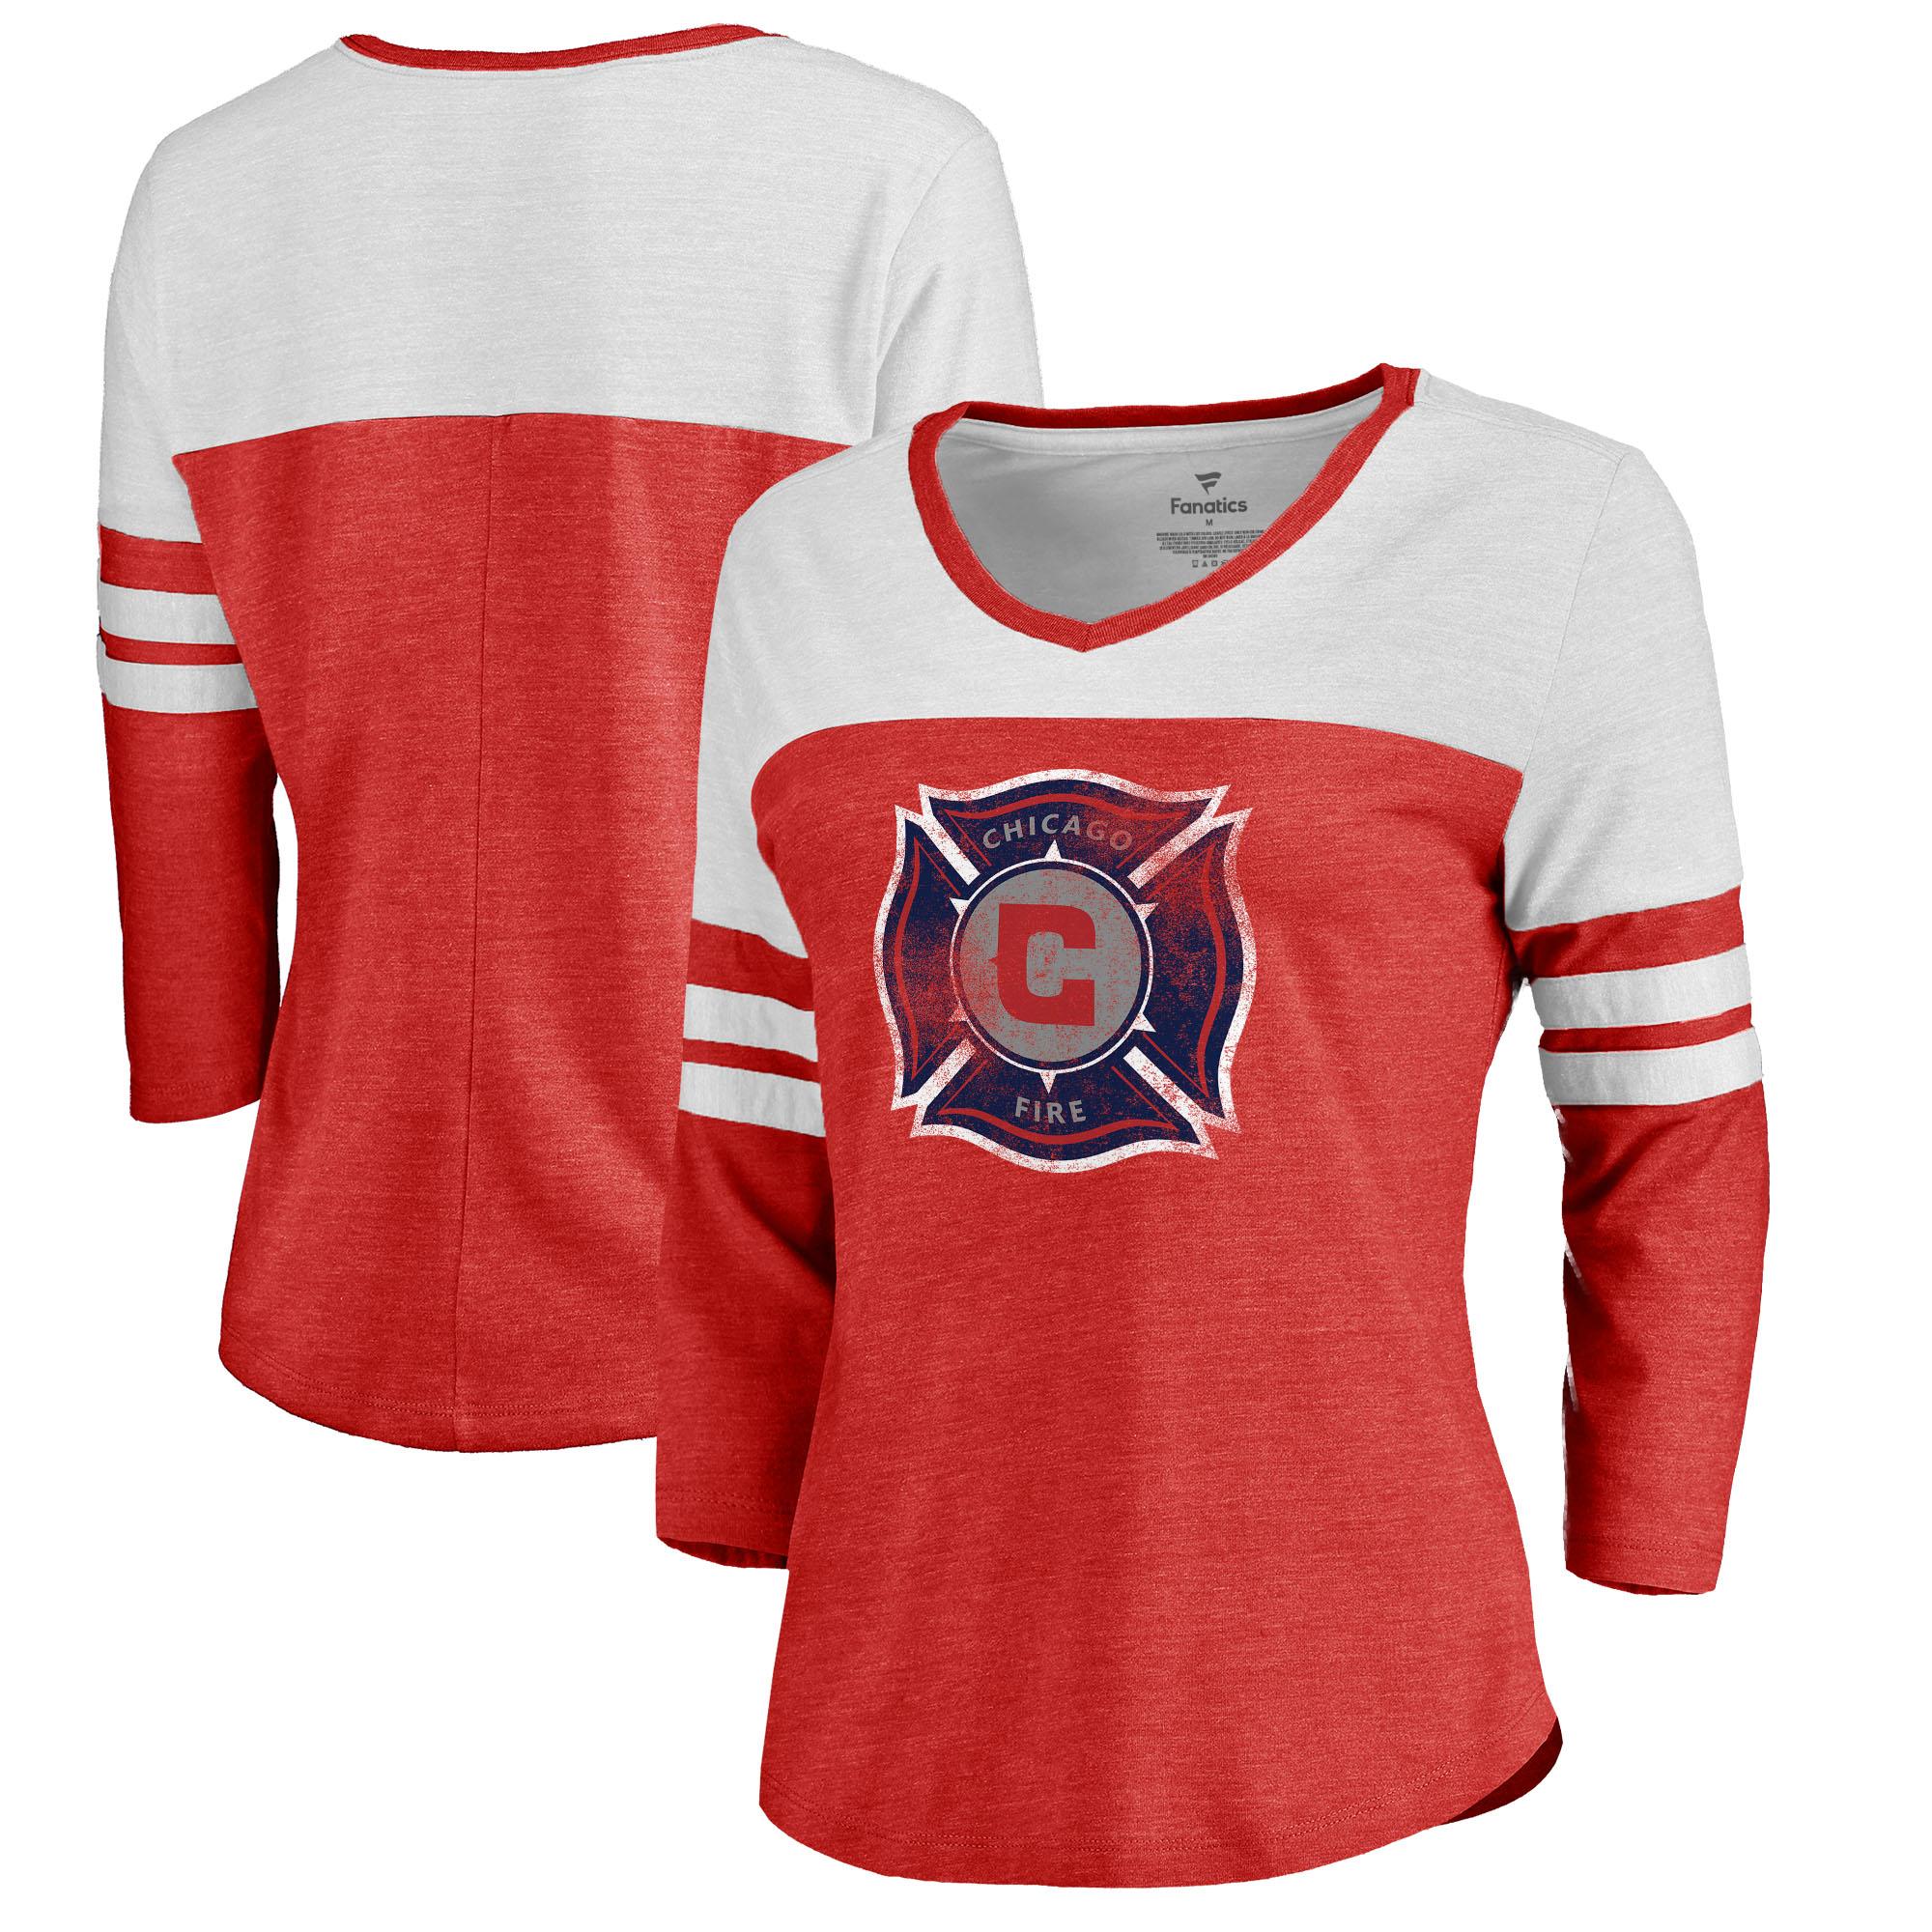 Chicago Fire Fanatics Branded Women's Distressed Primary Logo Raglan Tri-Blend 3/4 Sleeve T-Shirt - Red